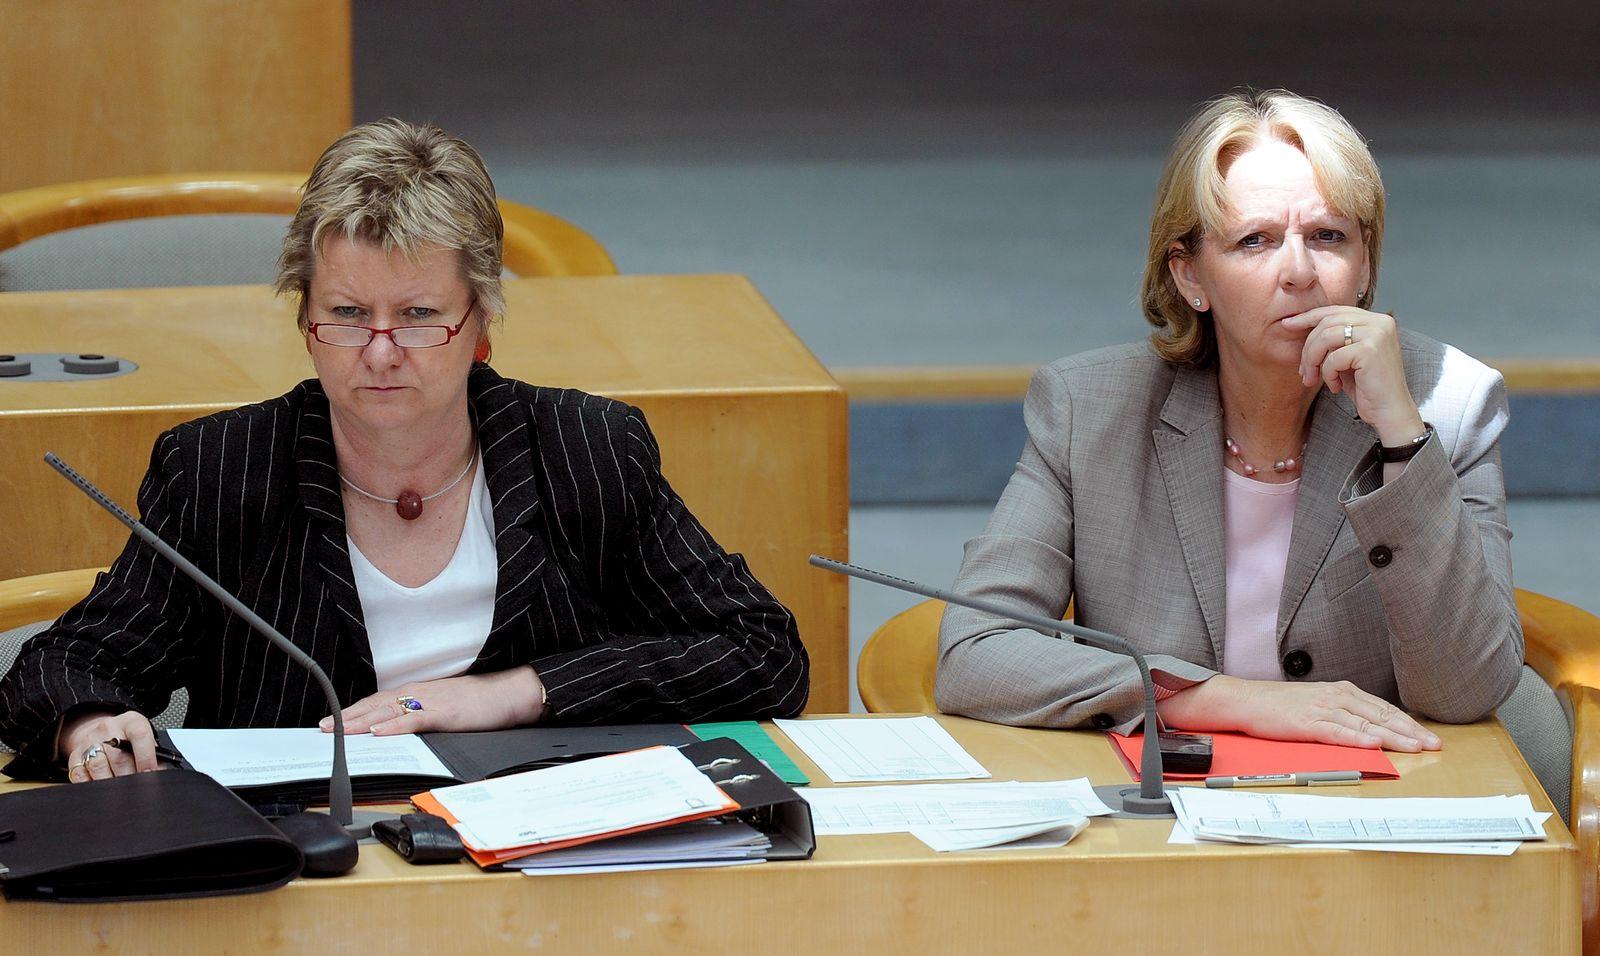 Sylvia Löhrmann / Hannelore Kraft